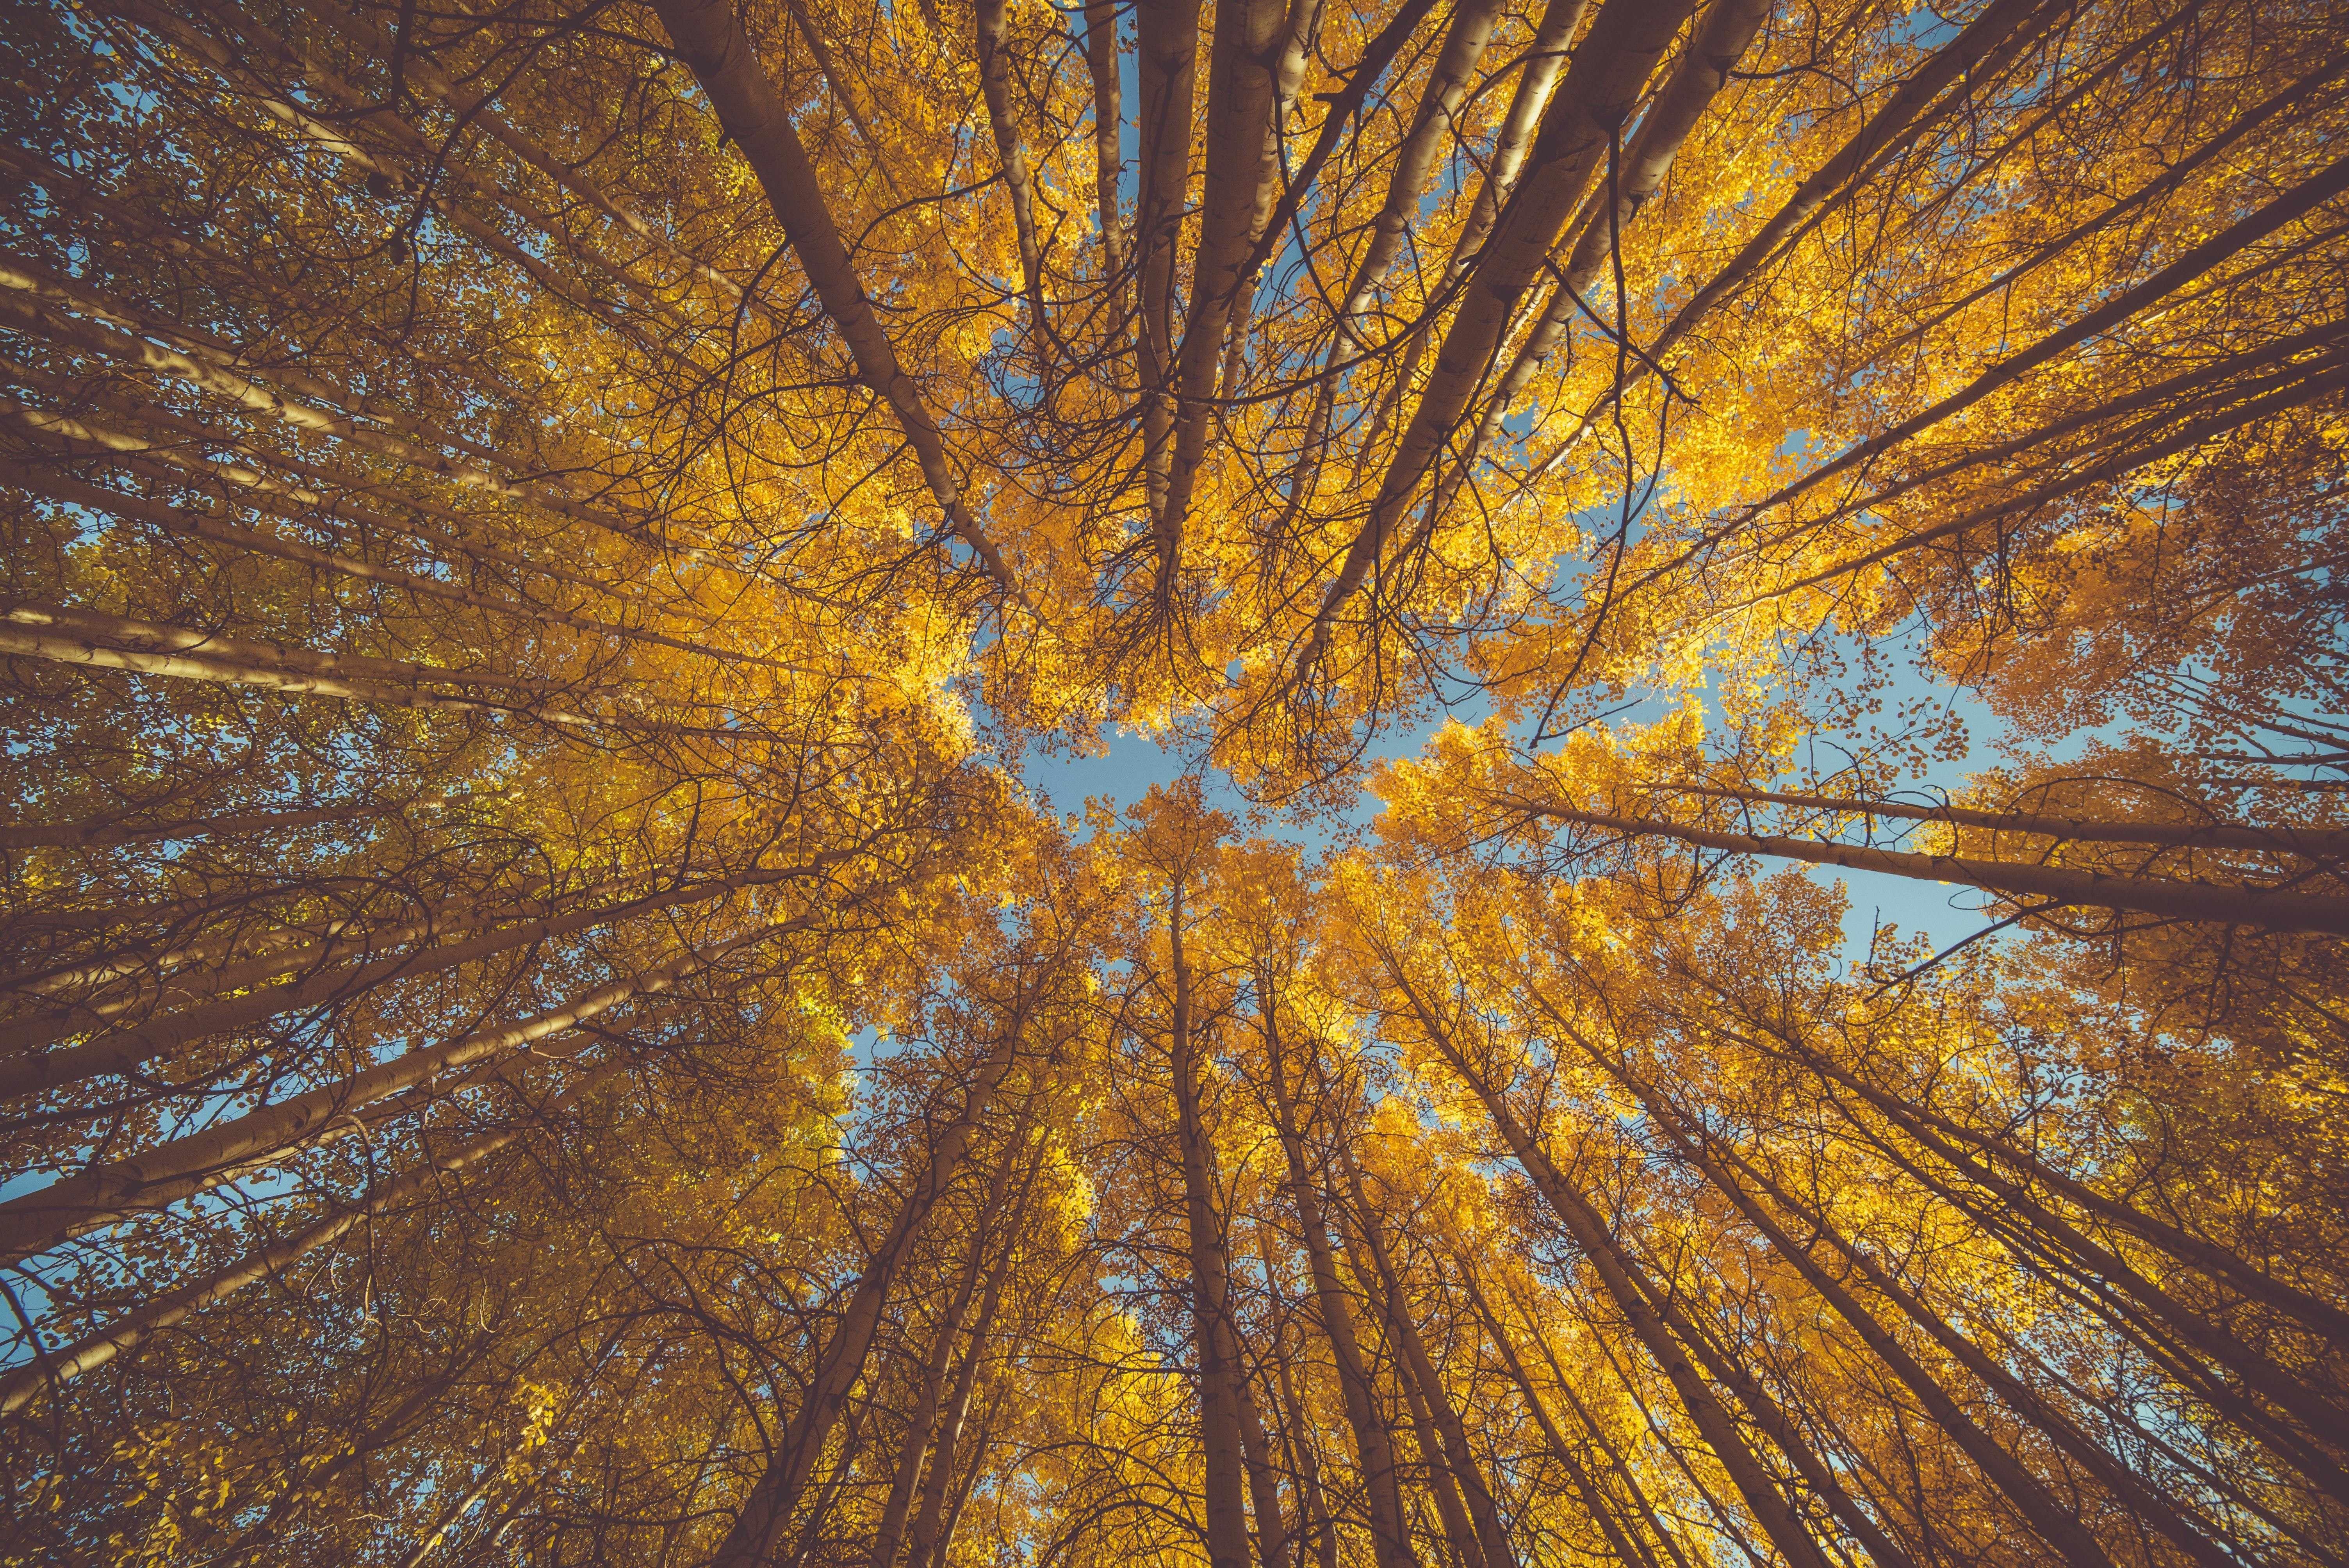 forests regenerative economy